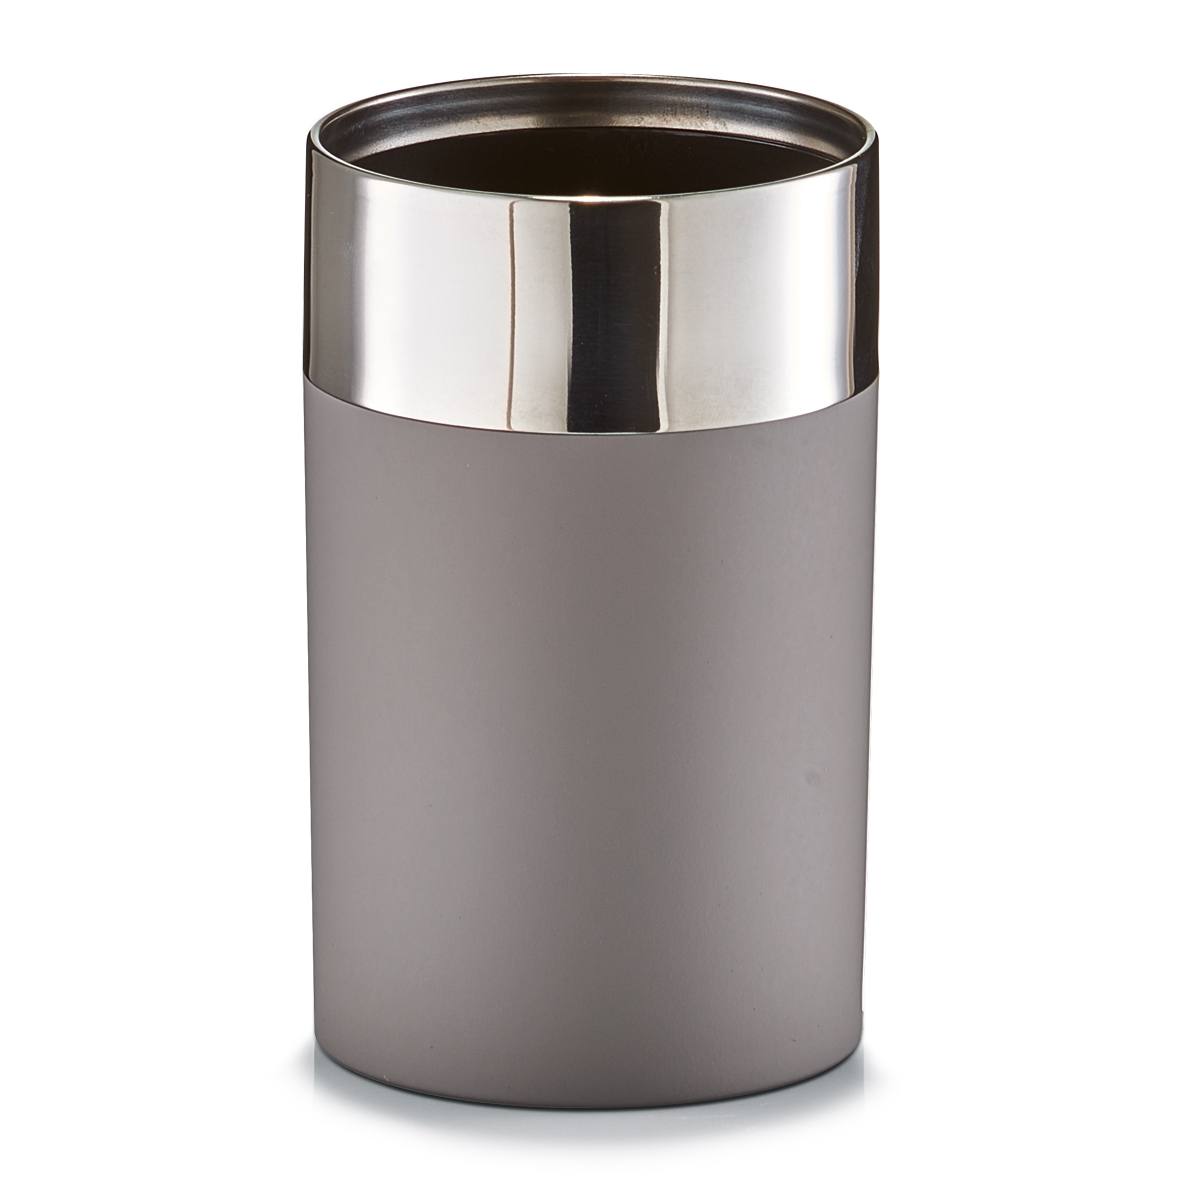 Pahar pentru periuta din plastic si inox, Taupe matte, Ø 6,5xH11 cm